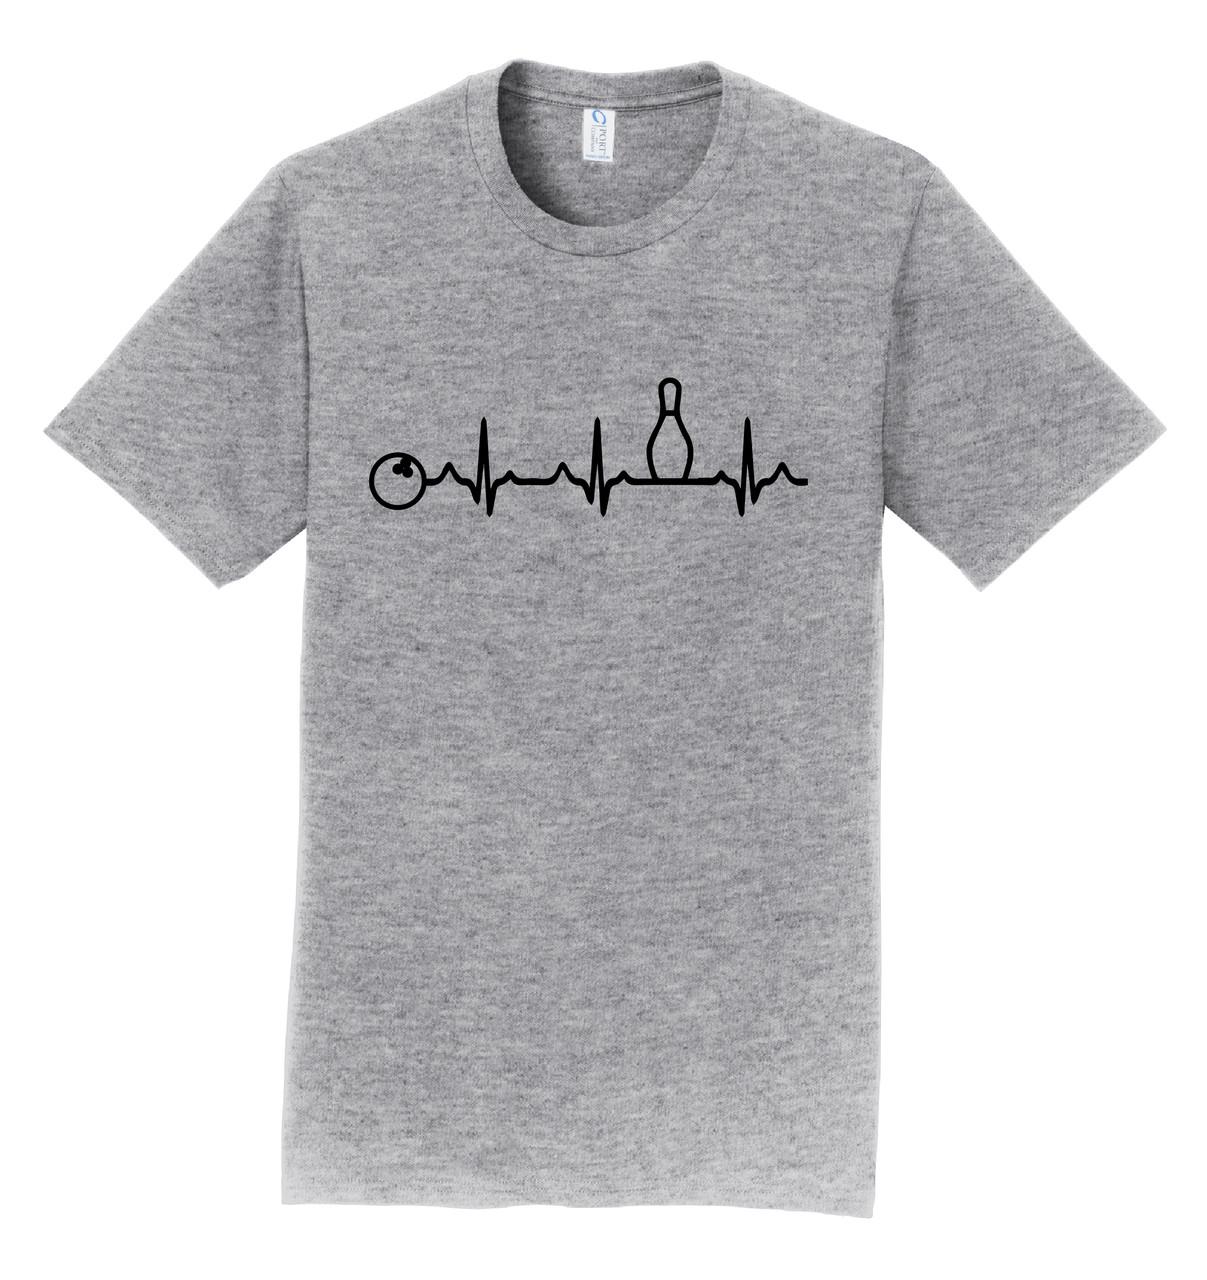 I AM Bowling T-Shirt - Bowling Heartbeat Black Logo - 8 Colors